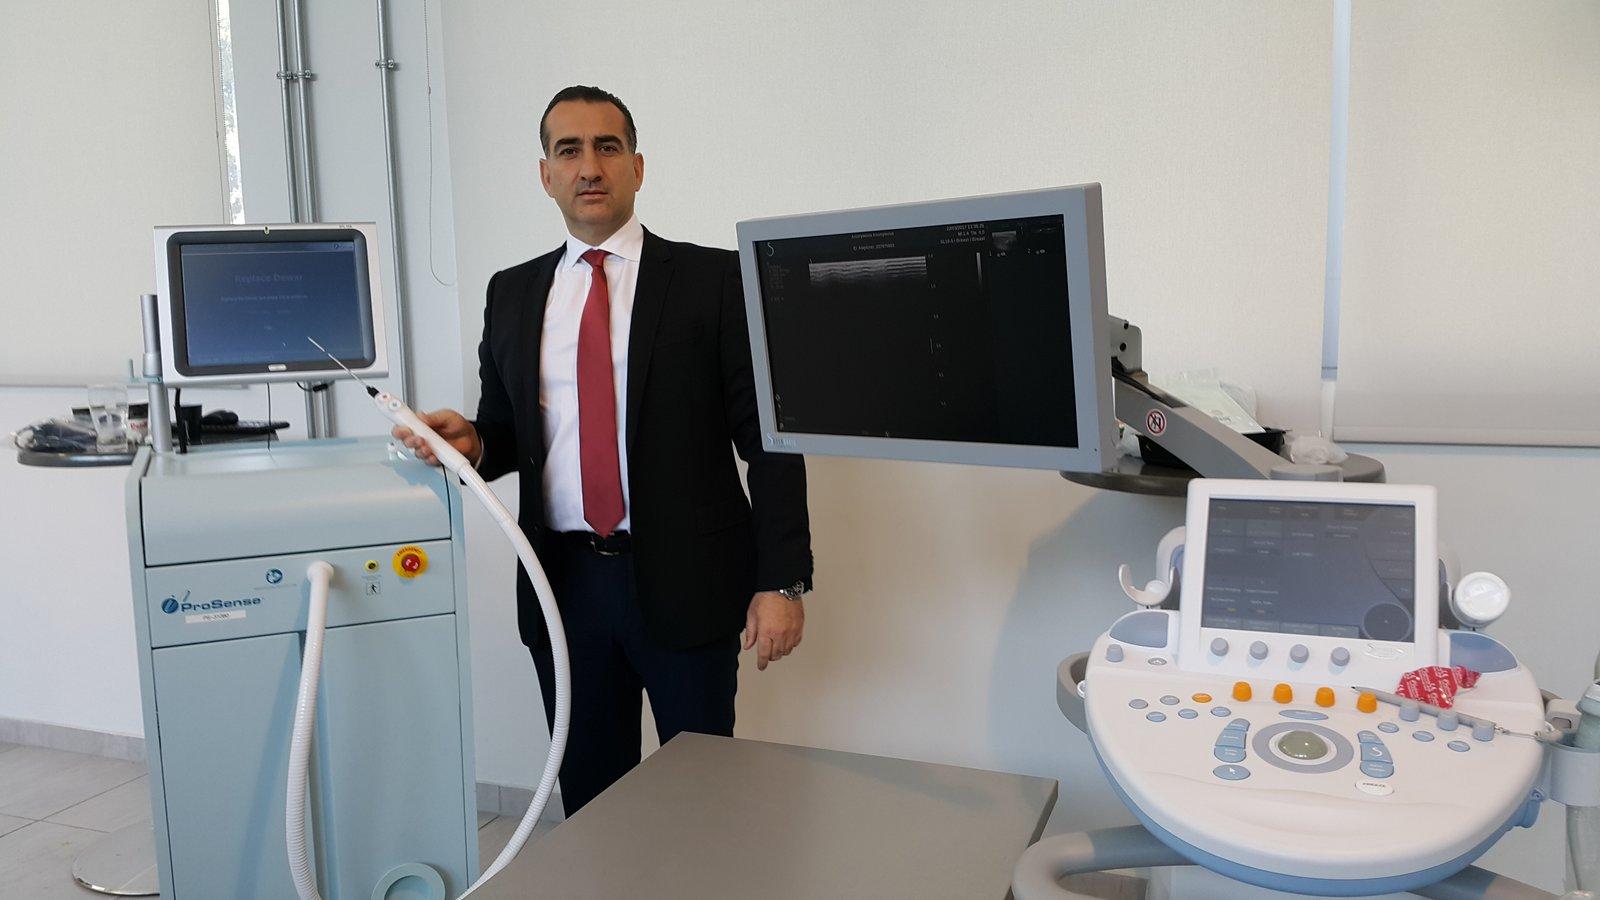 Cryoablation - Γεώργιος Παπάζογλου Χειρουργός Μαστού, Διευθυντής Γ' Κλινικής Μαστού ΜΗΤΕΡΑ